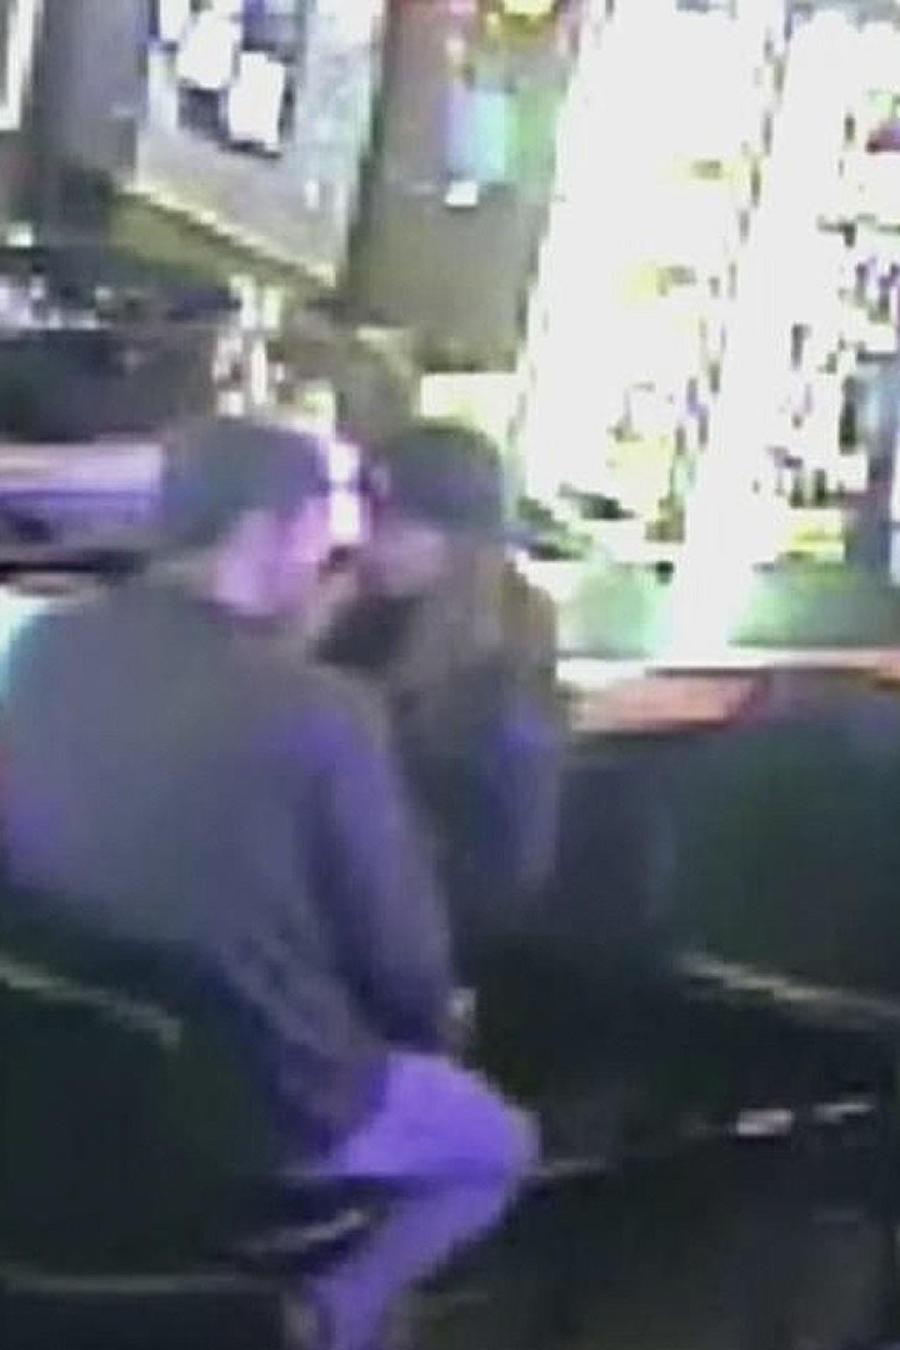 pareja besandose en robo